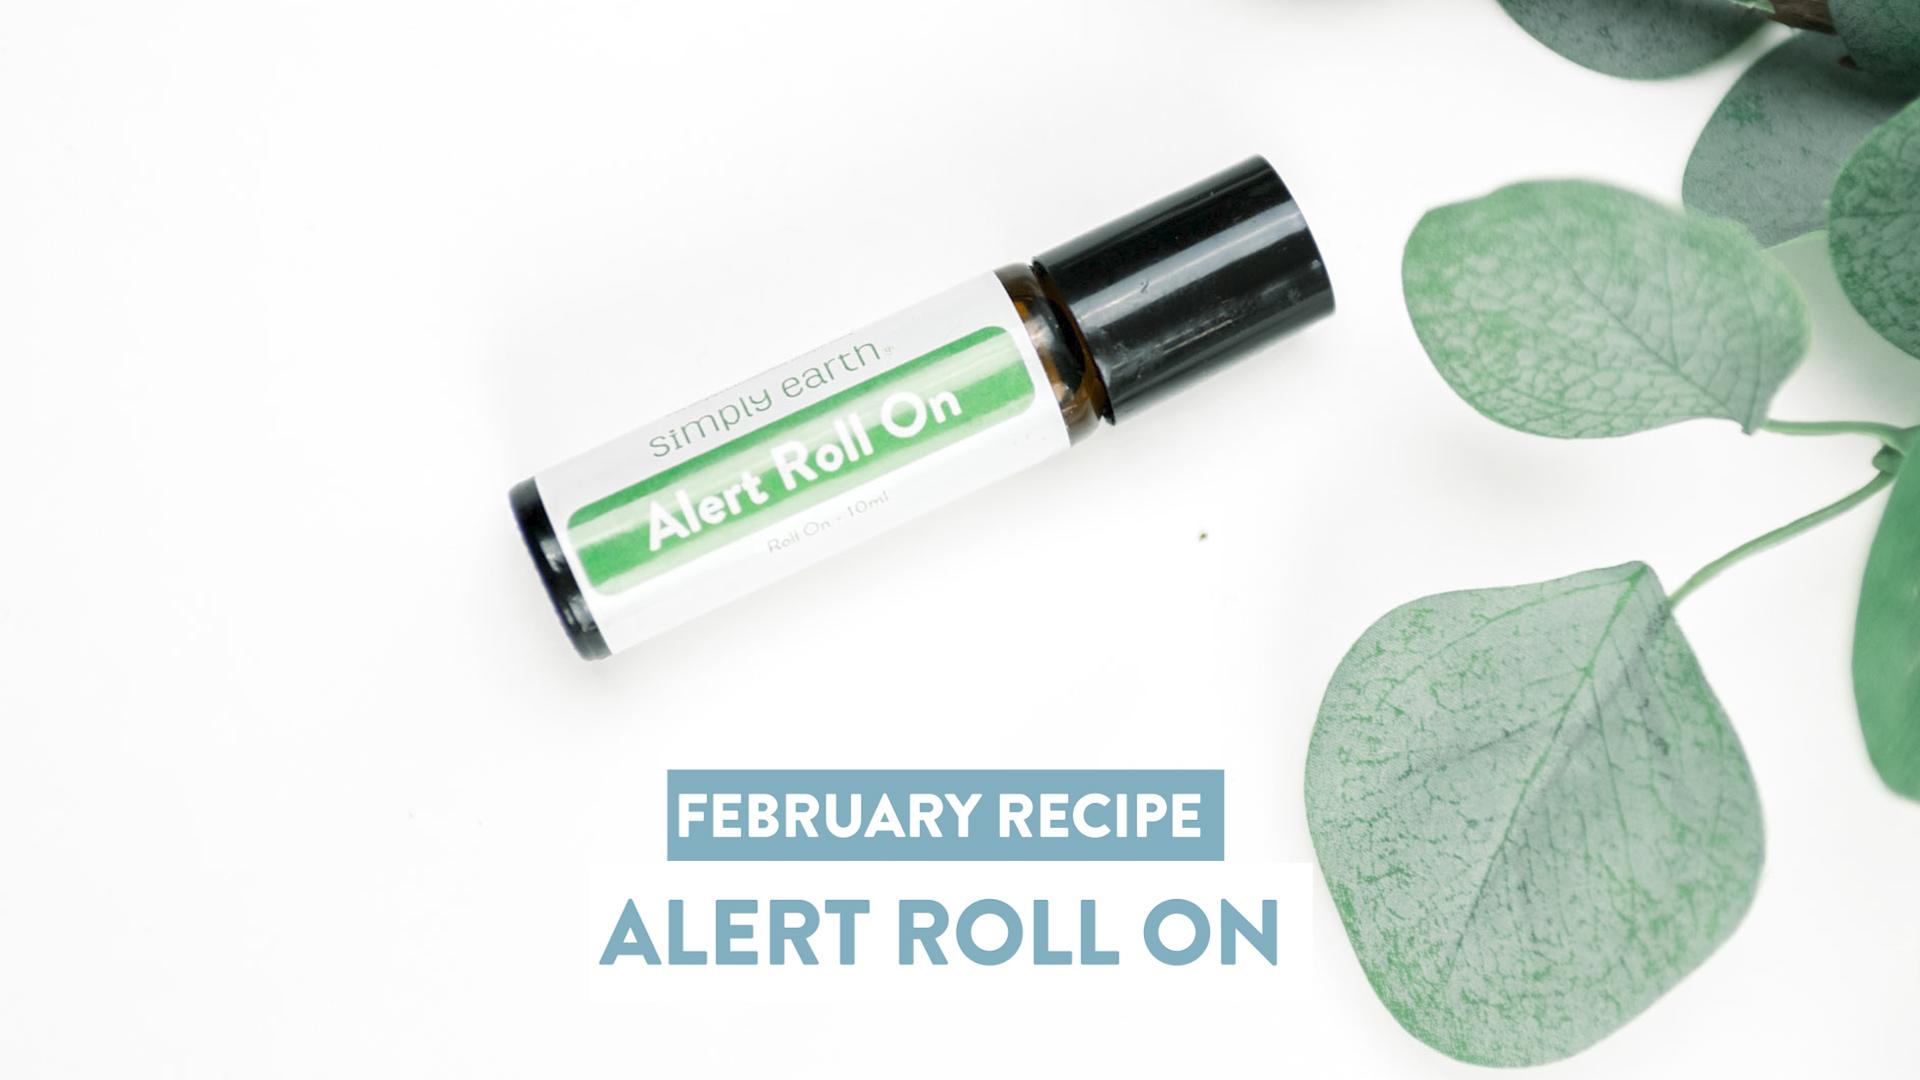 Alert Roll-On